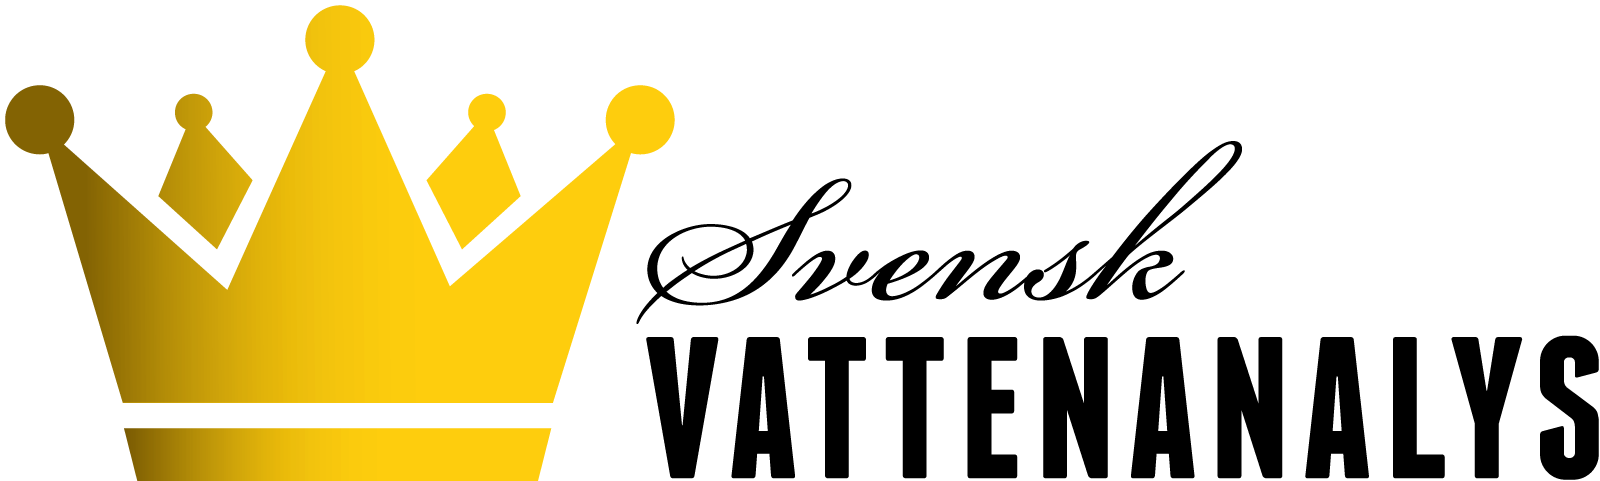 Svensk Vattenanalys logo